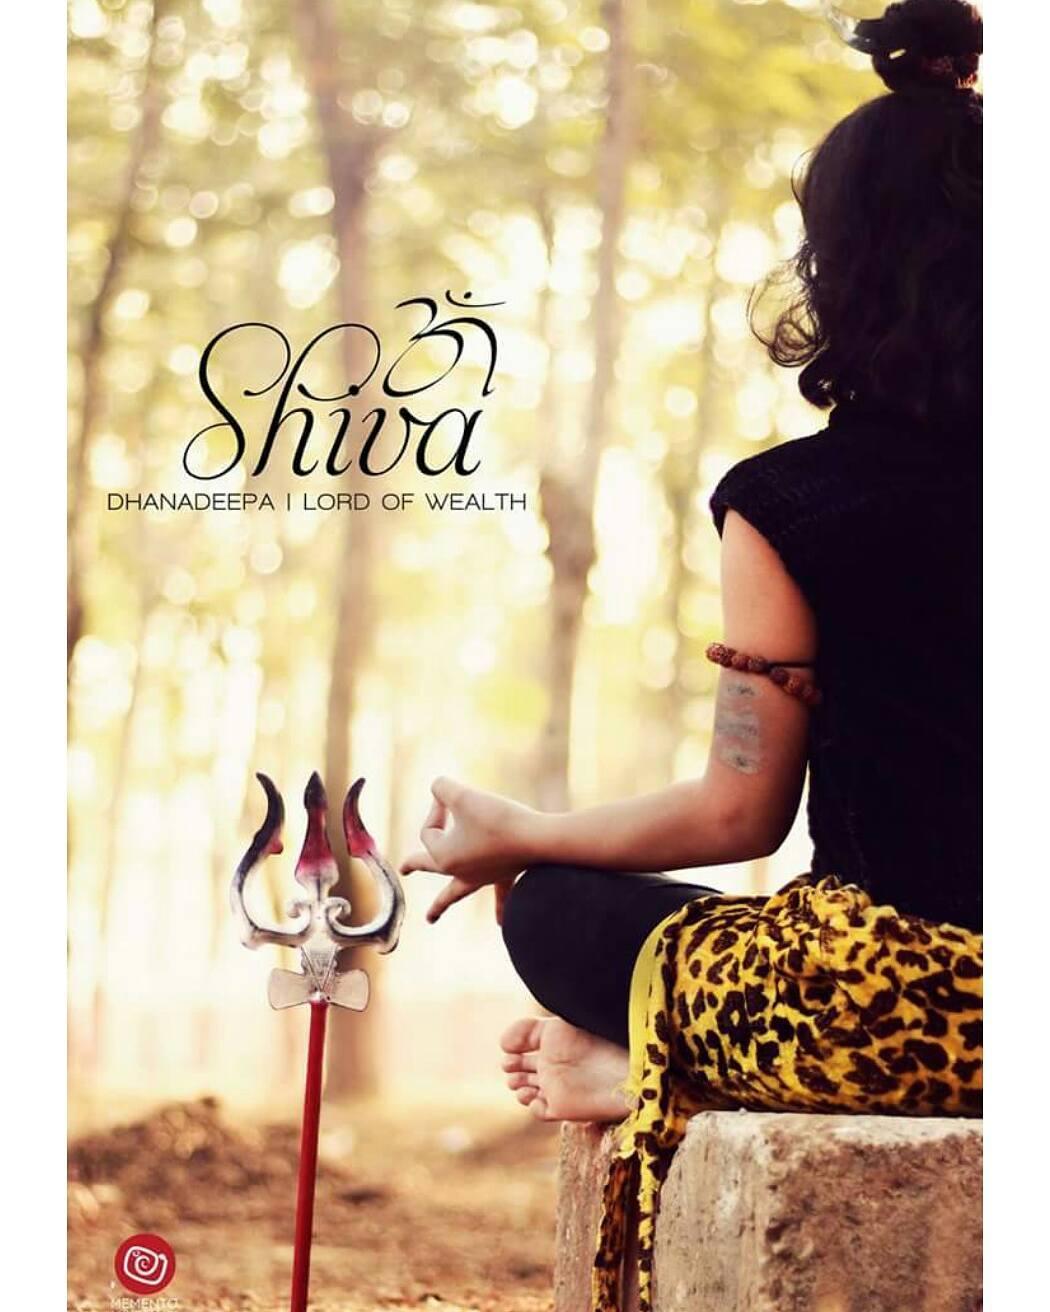 Ohm Shiva  #Dhanadeepa | Lord of Wealth.  Maha Shivratri Concept Shoot by : Dip Thakkar & Հիօ ՀօիօլւՀ թզԻէի  #om #ohmShiva #omshiv #omshiva #Shivratri #LordShiva #festival #India #gujaratifestivals #shivlord #conceptphotoshoot #photography #kidsphotography #kidsshoot #bholenath #lordshiva #shiva #festival #photooftheday #picoftheday #conceptart #photo #photoshoot #instagram #instagood